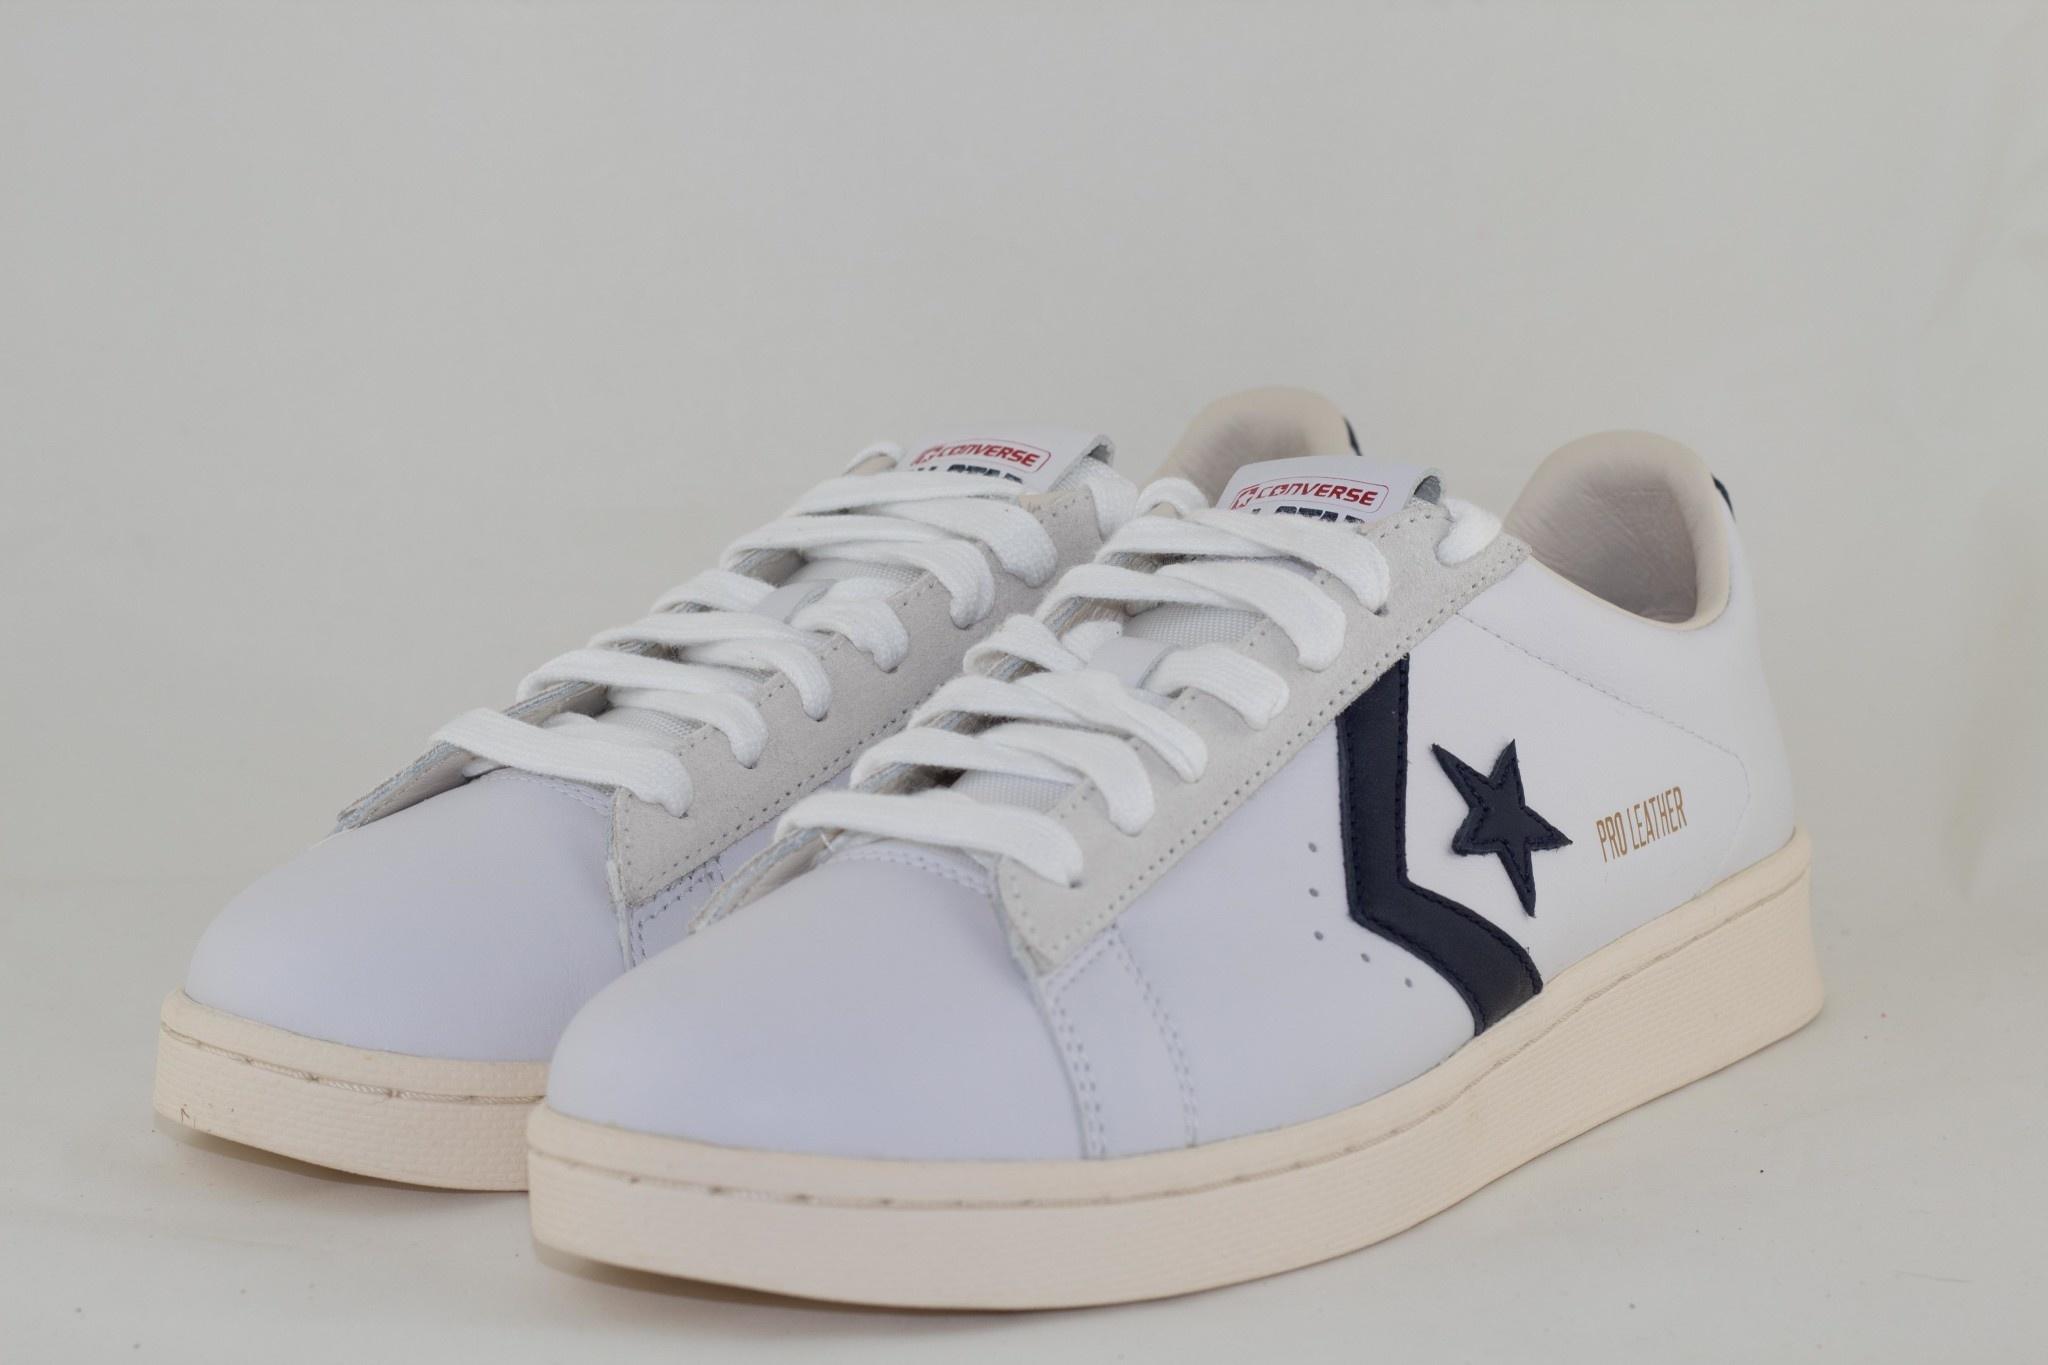 Converse PRO LEATHER OG - OX - White/Obsidian/Egret